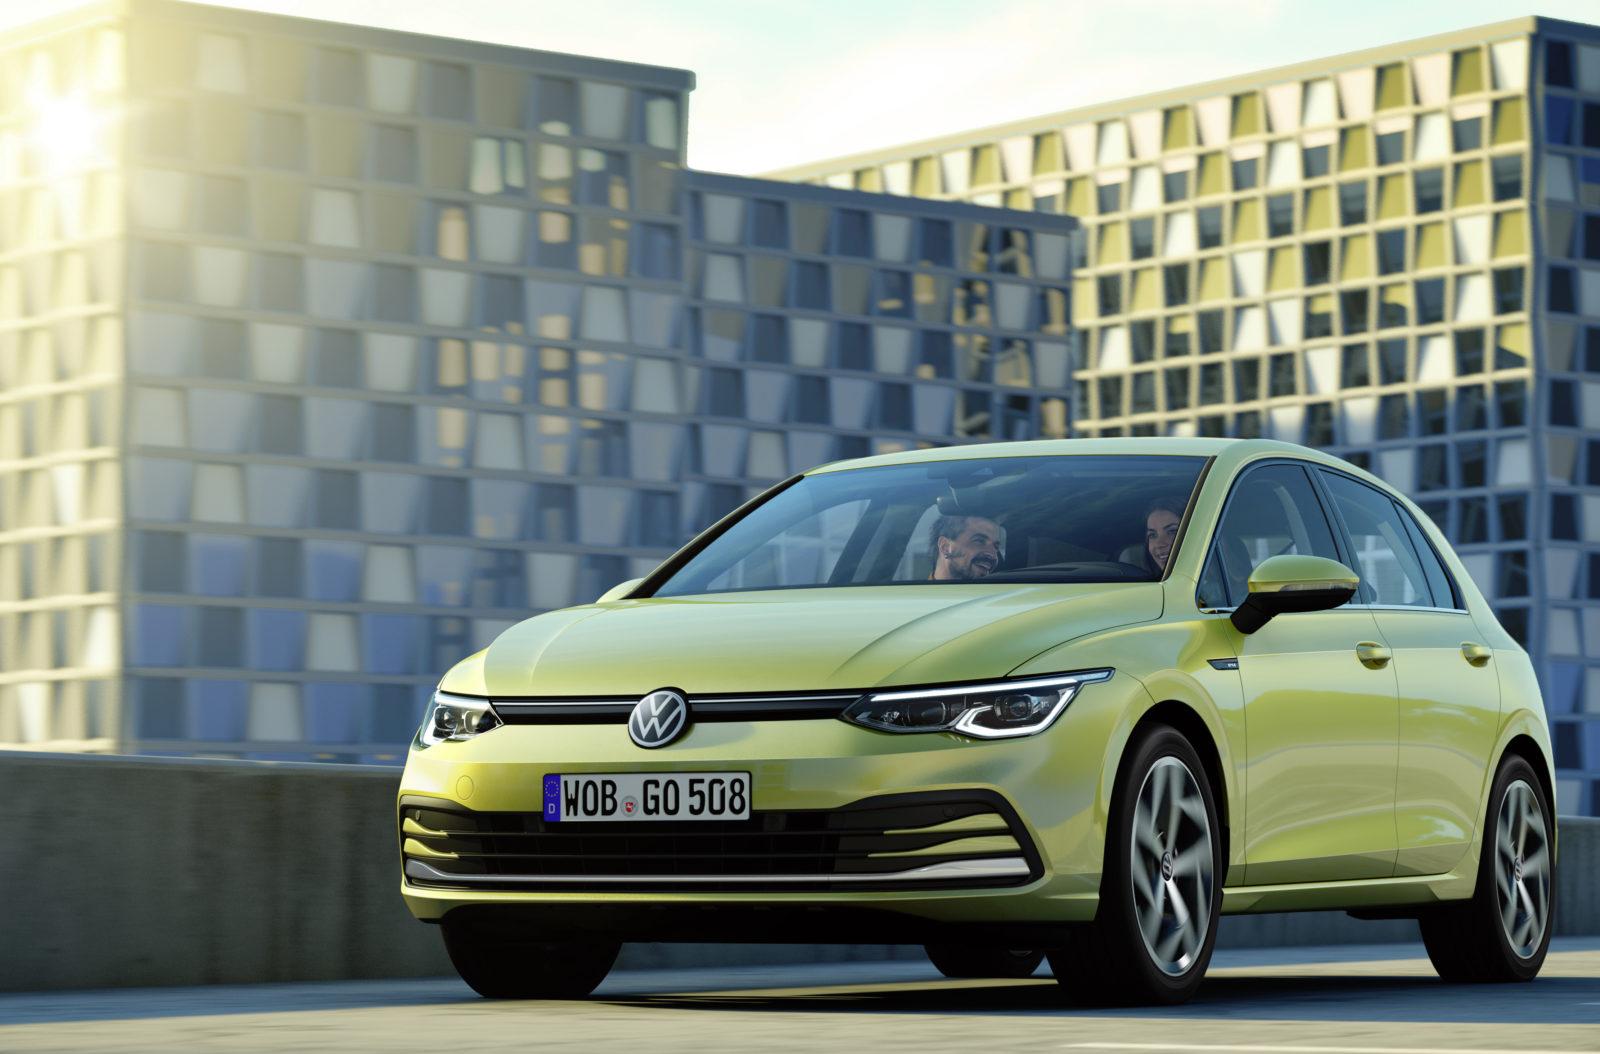 new volkswagen golf mk8 - details of 2020 model revealed